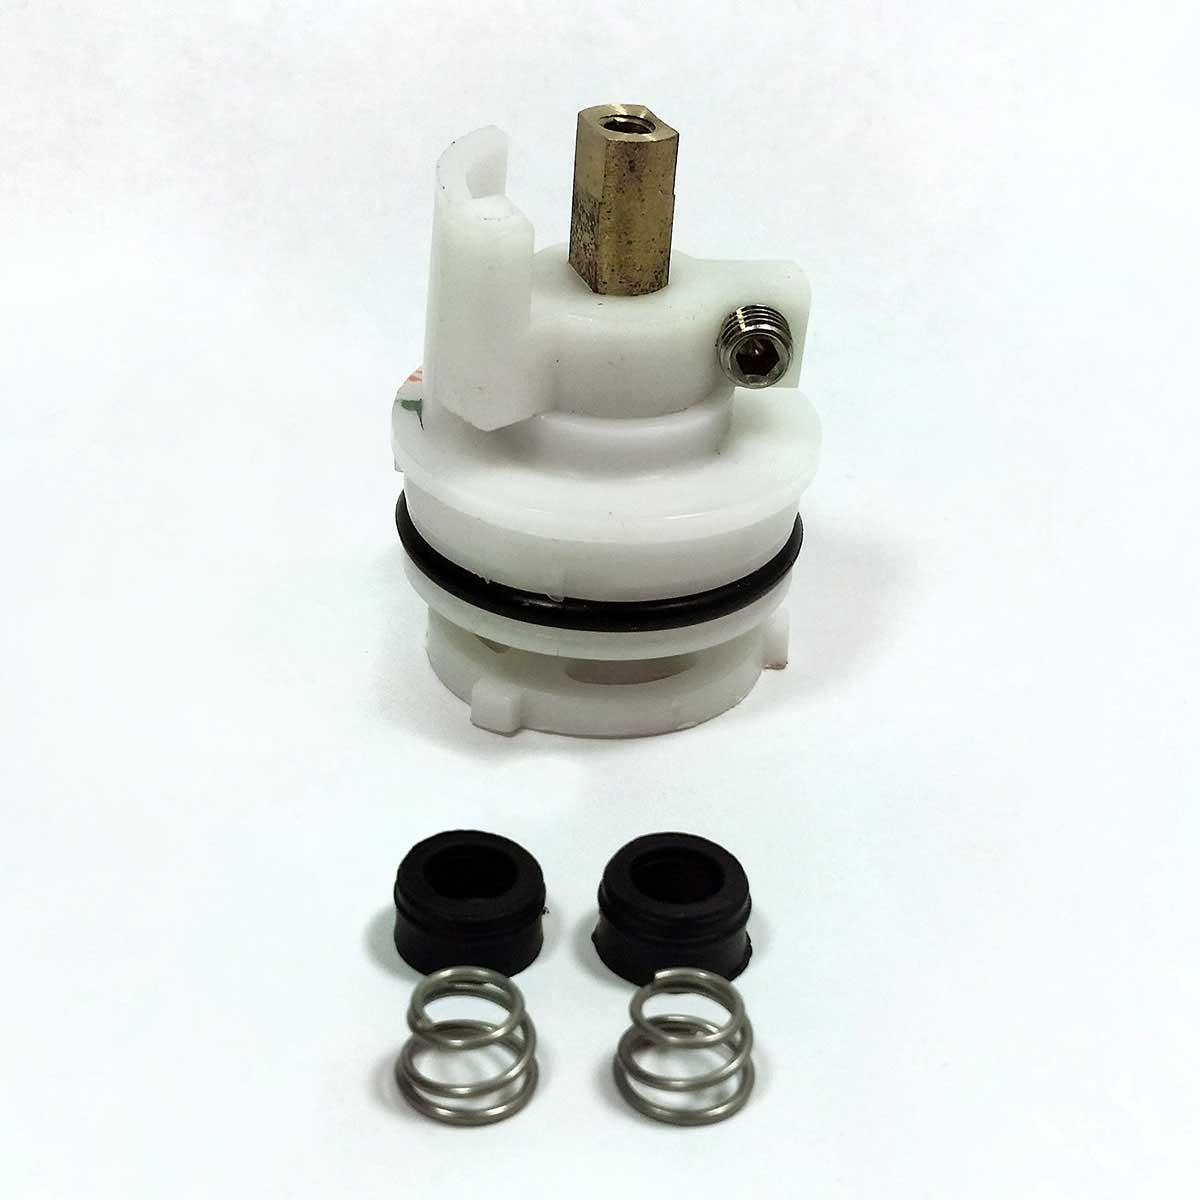 Repair Kit For Delta Faucet RP1991 Shower Cartridge - Includes Seats ...